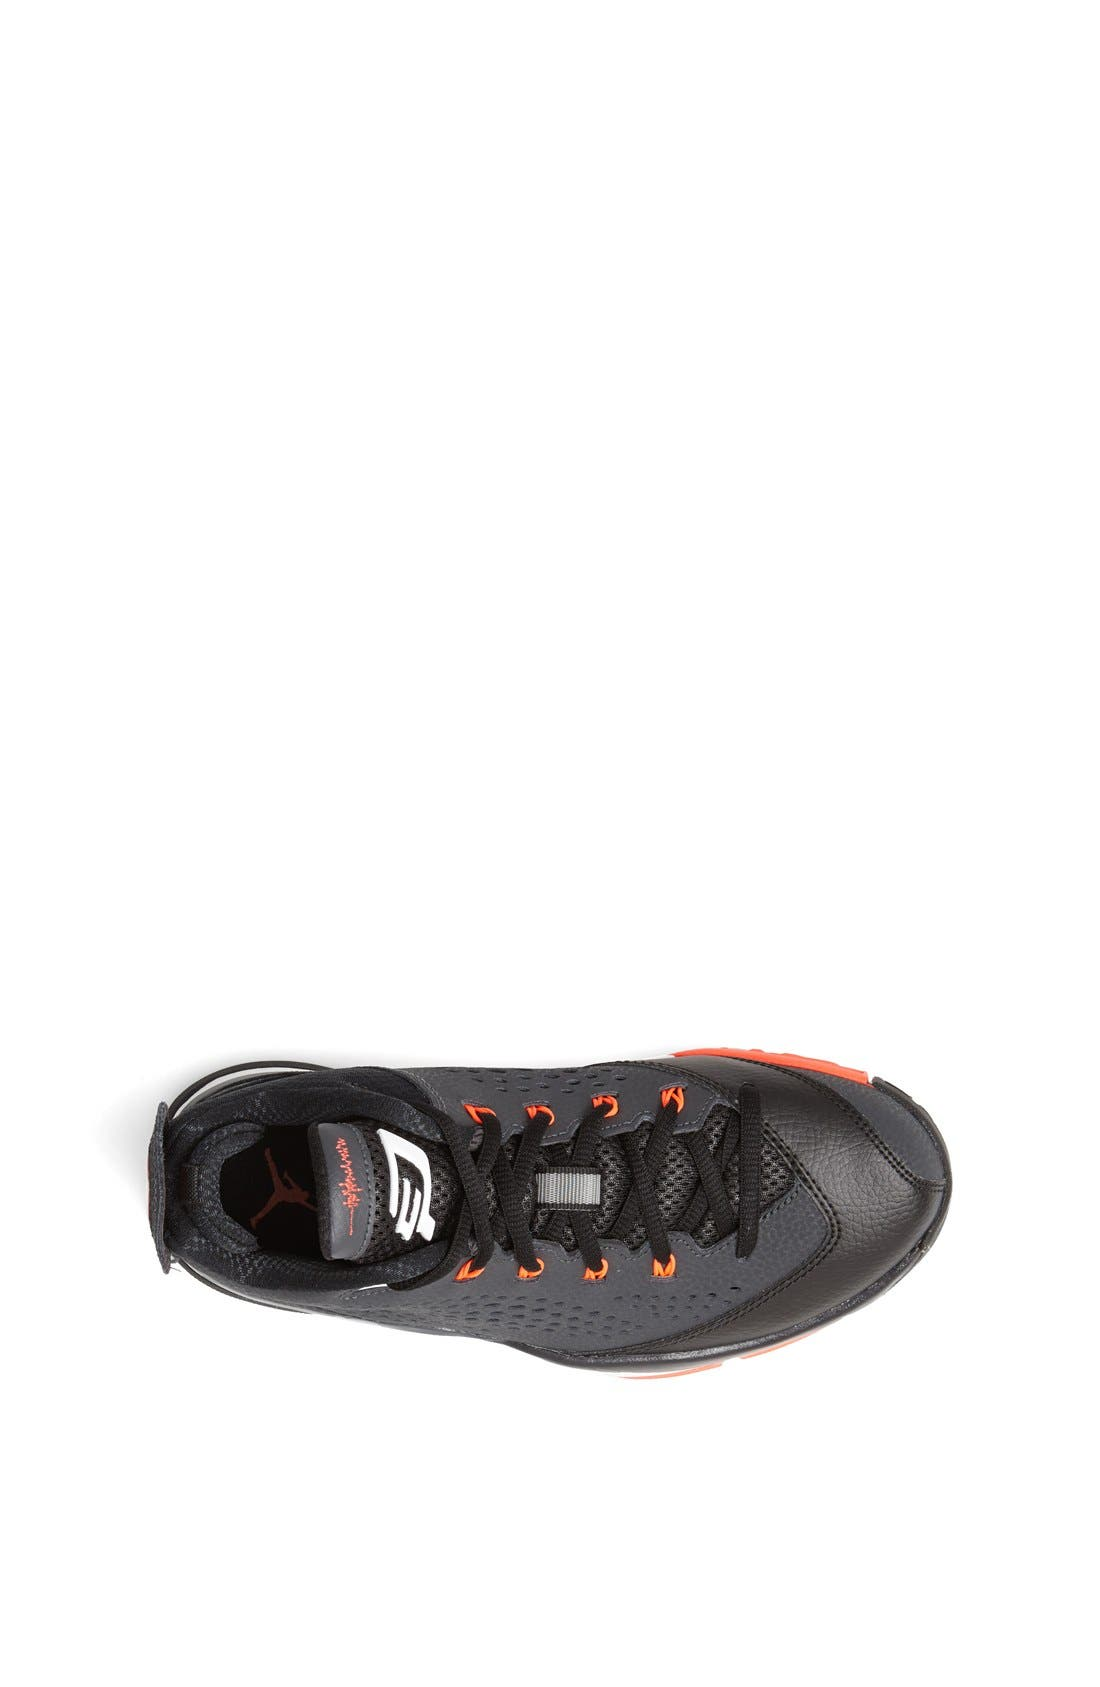 Alternate Image 3  - Nike 'Jordan CP3.VII' Sneaker (Big Kid)